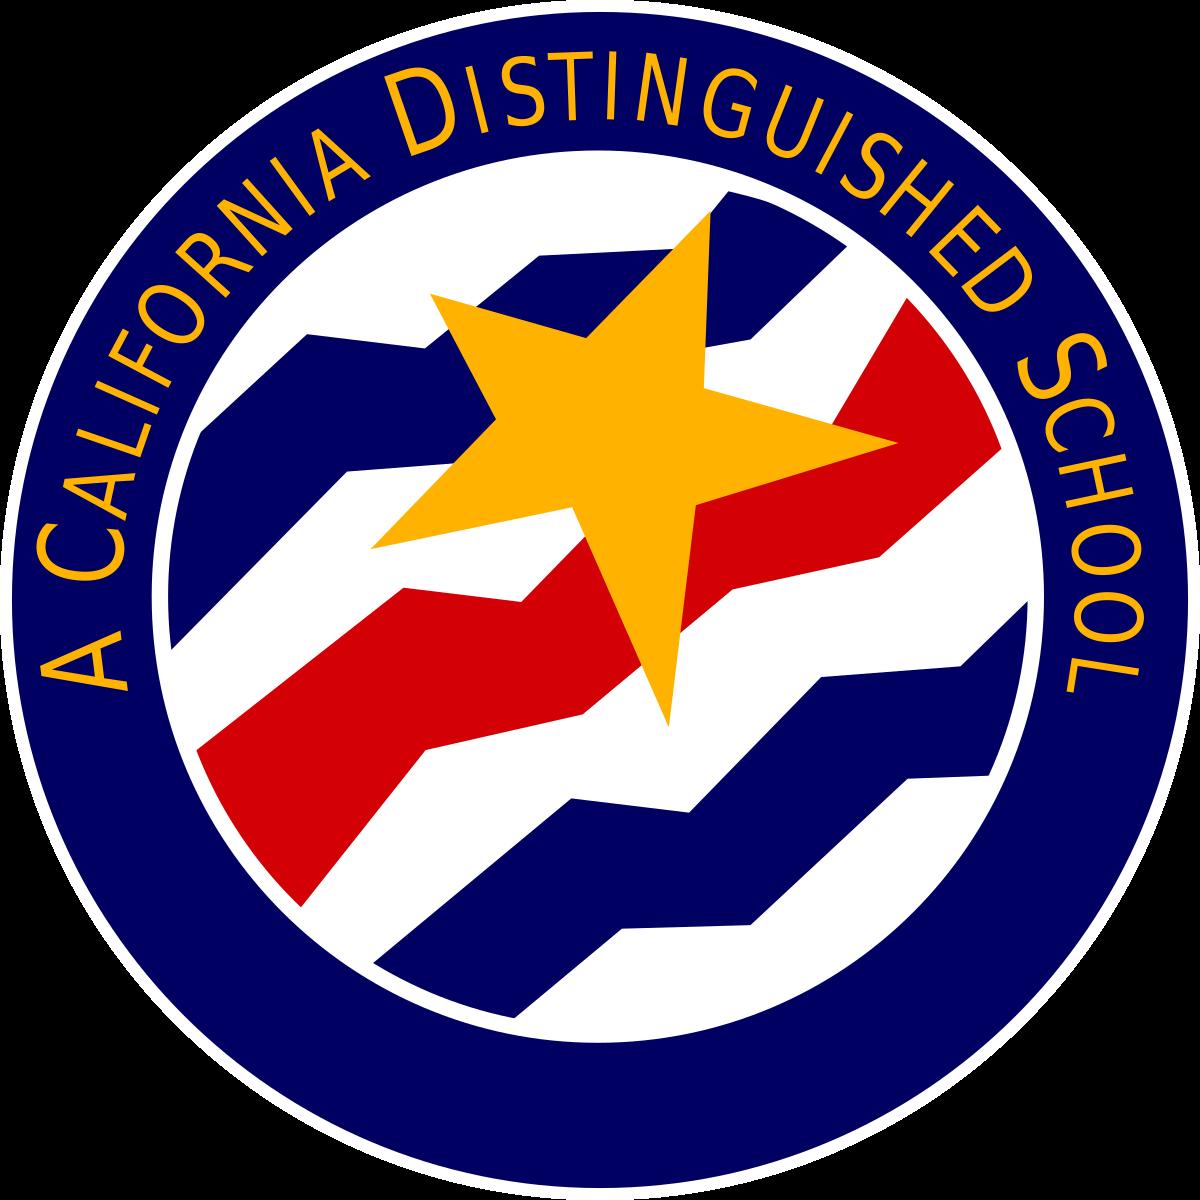 California Distinguished Schools Include Three in Ventura County